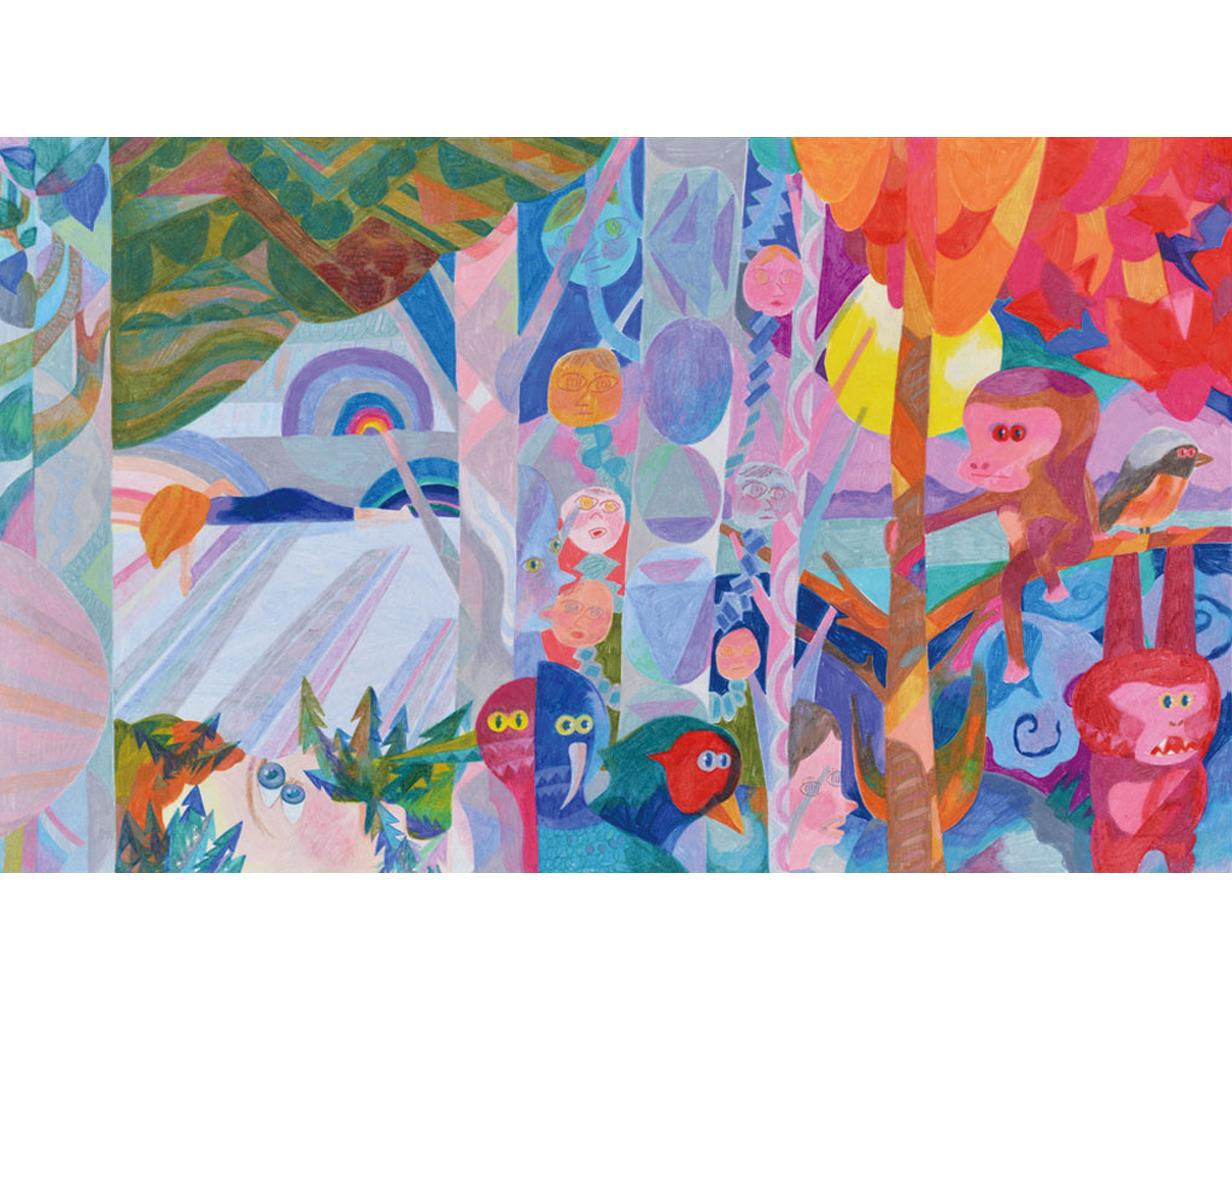 Re-Kaido Niigata,   2018  48cm x 80cm  Colour pencils on paper